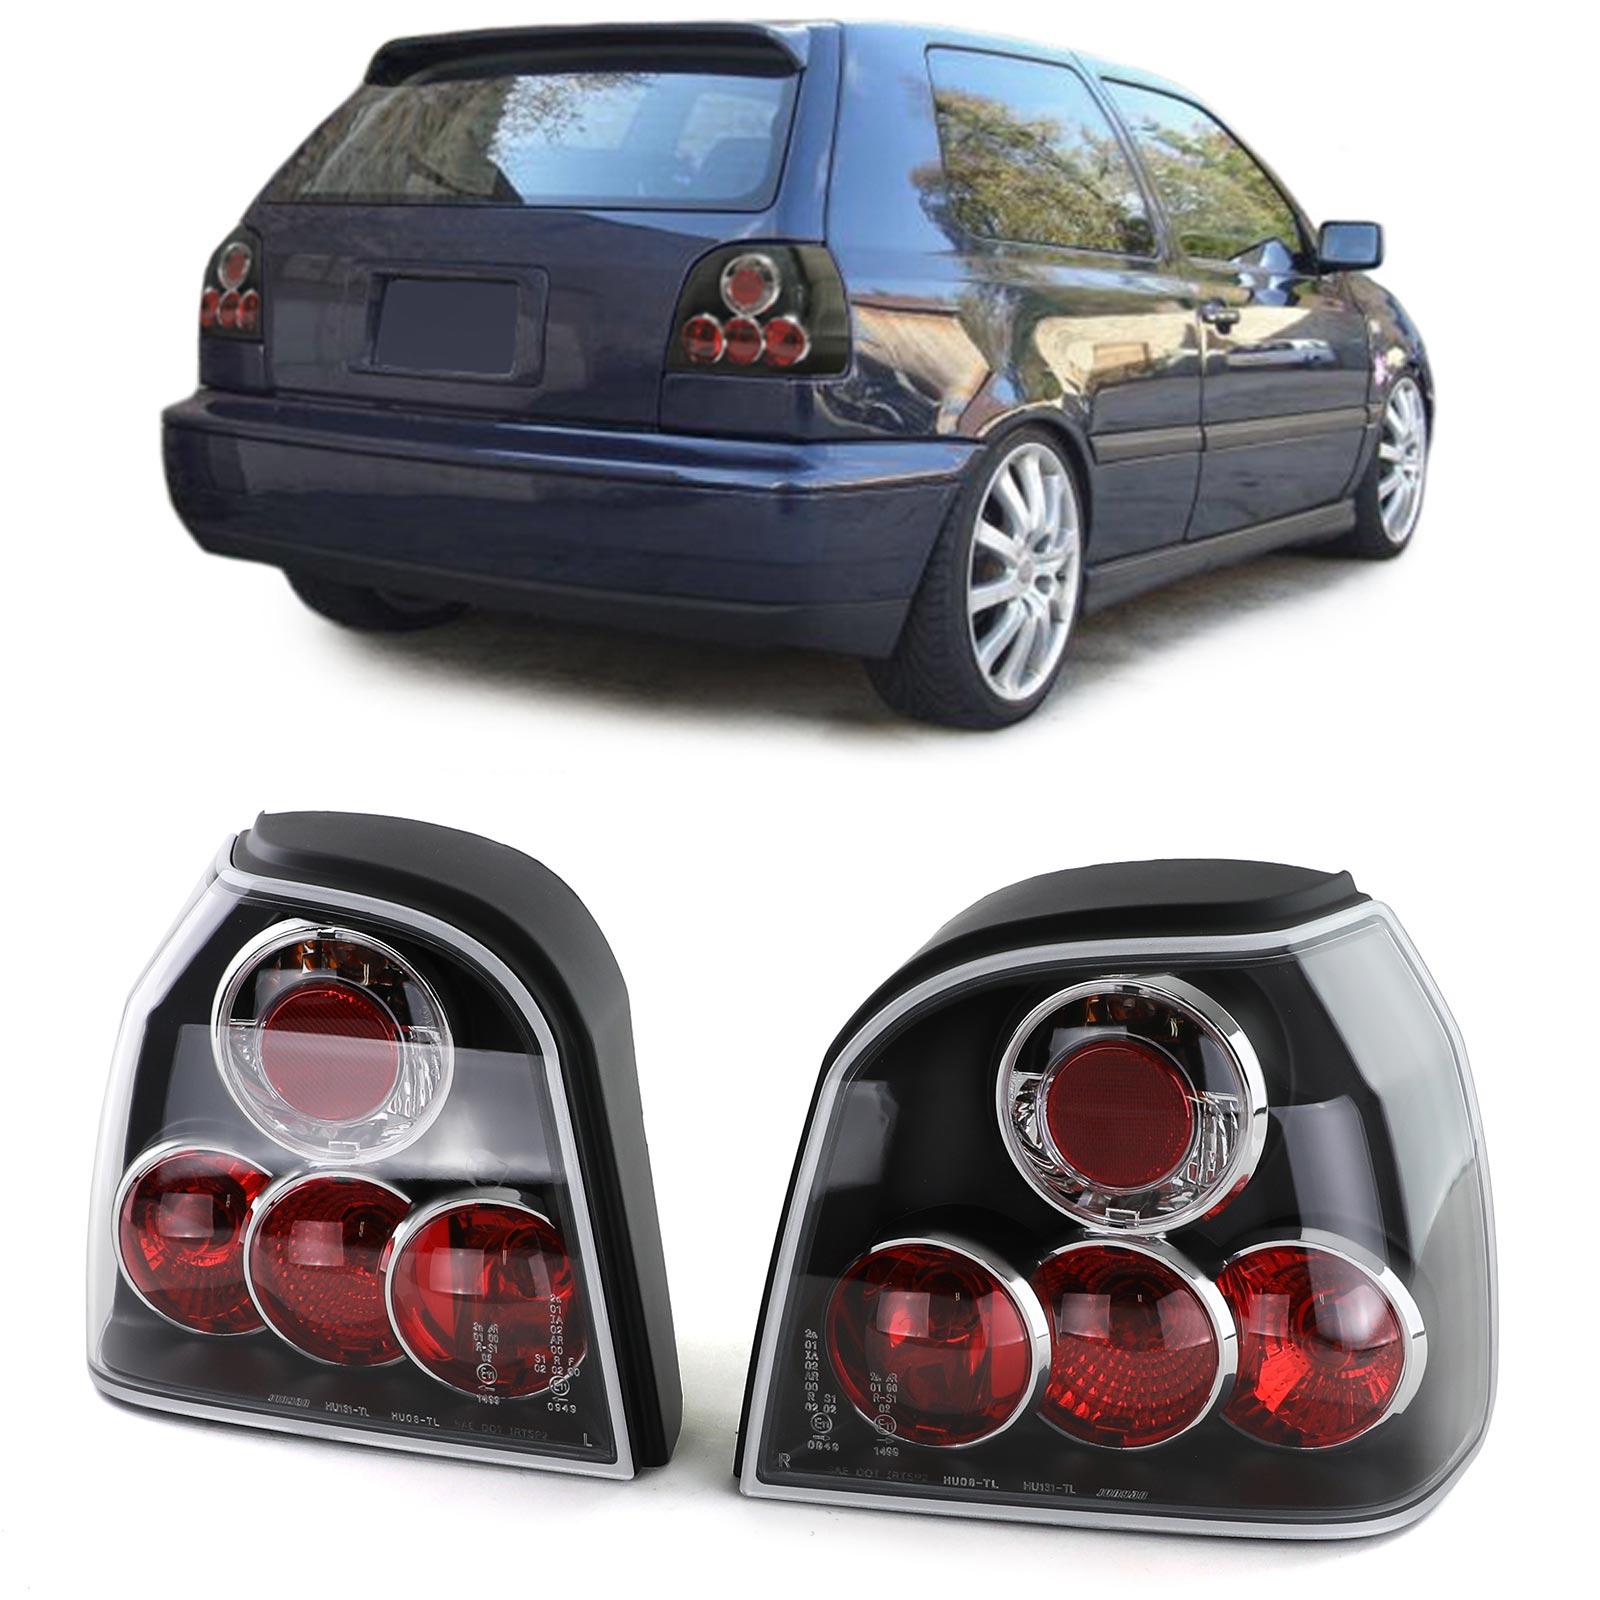 VW Golf 3 Farolins lexus preto